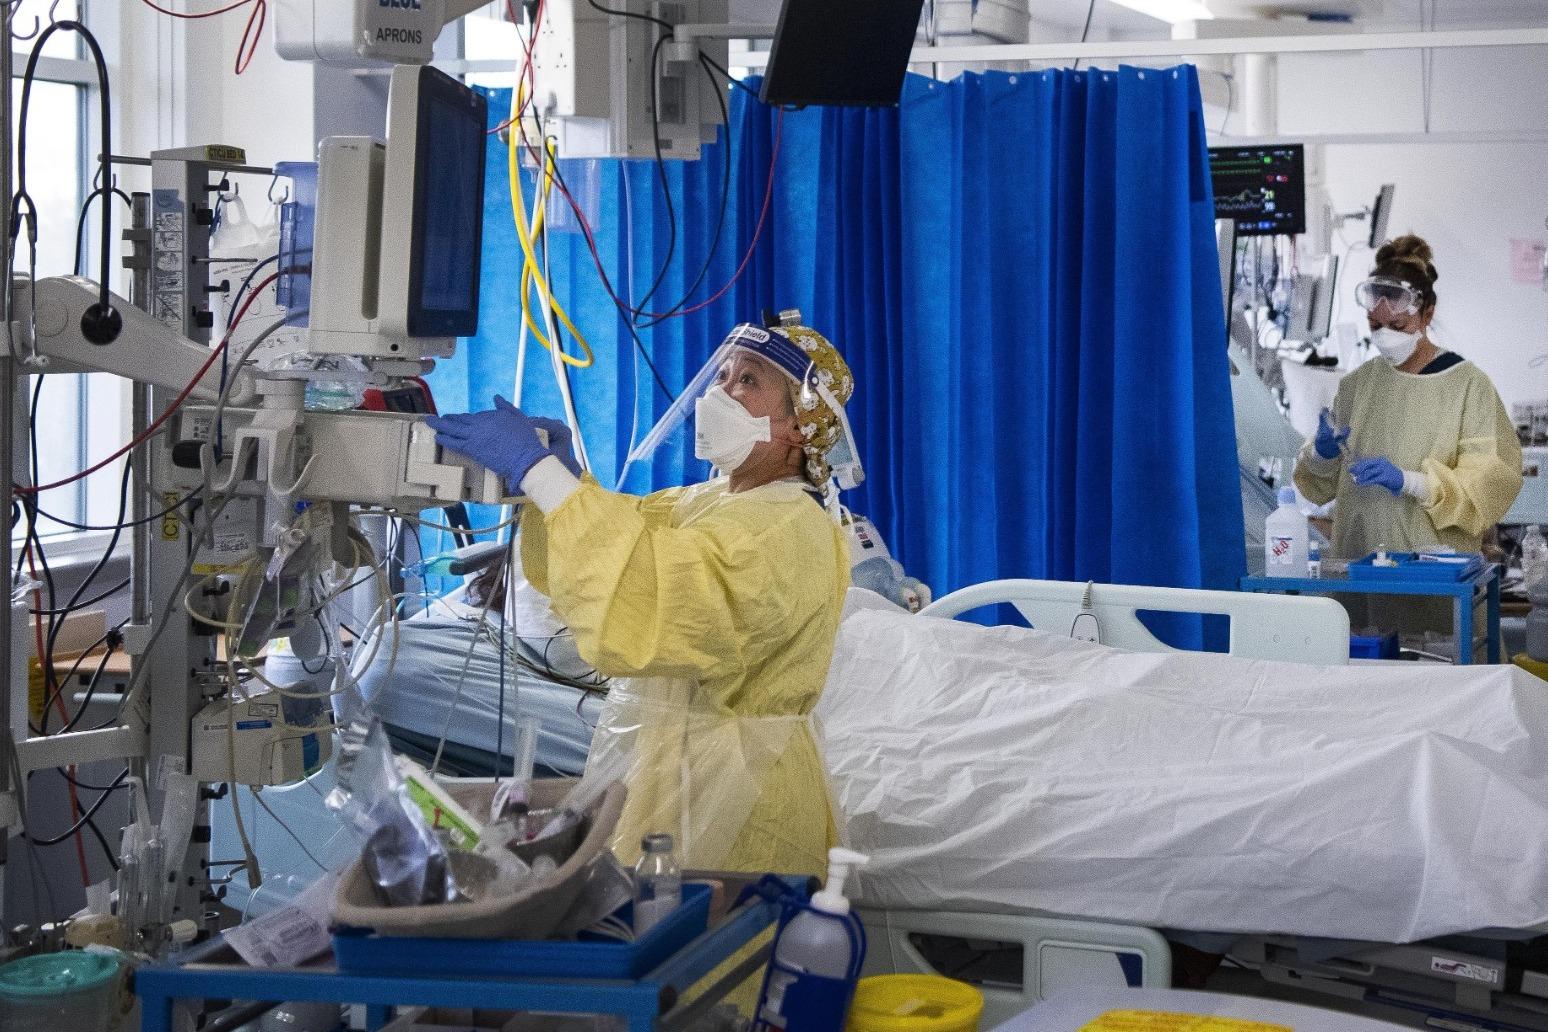 Larger risk of hospitalisation in Delta variant sufferers